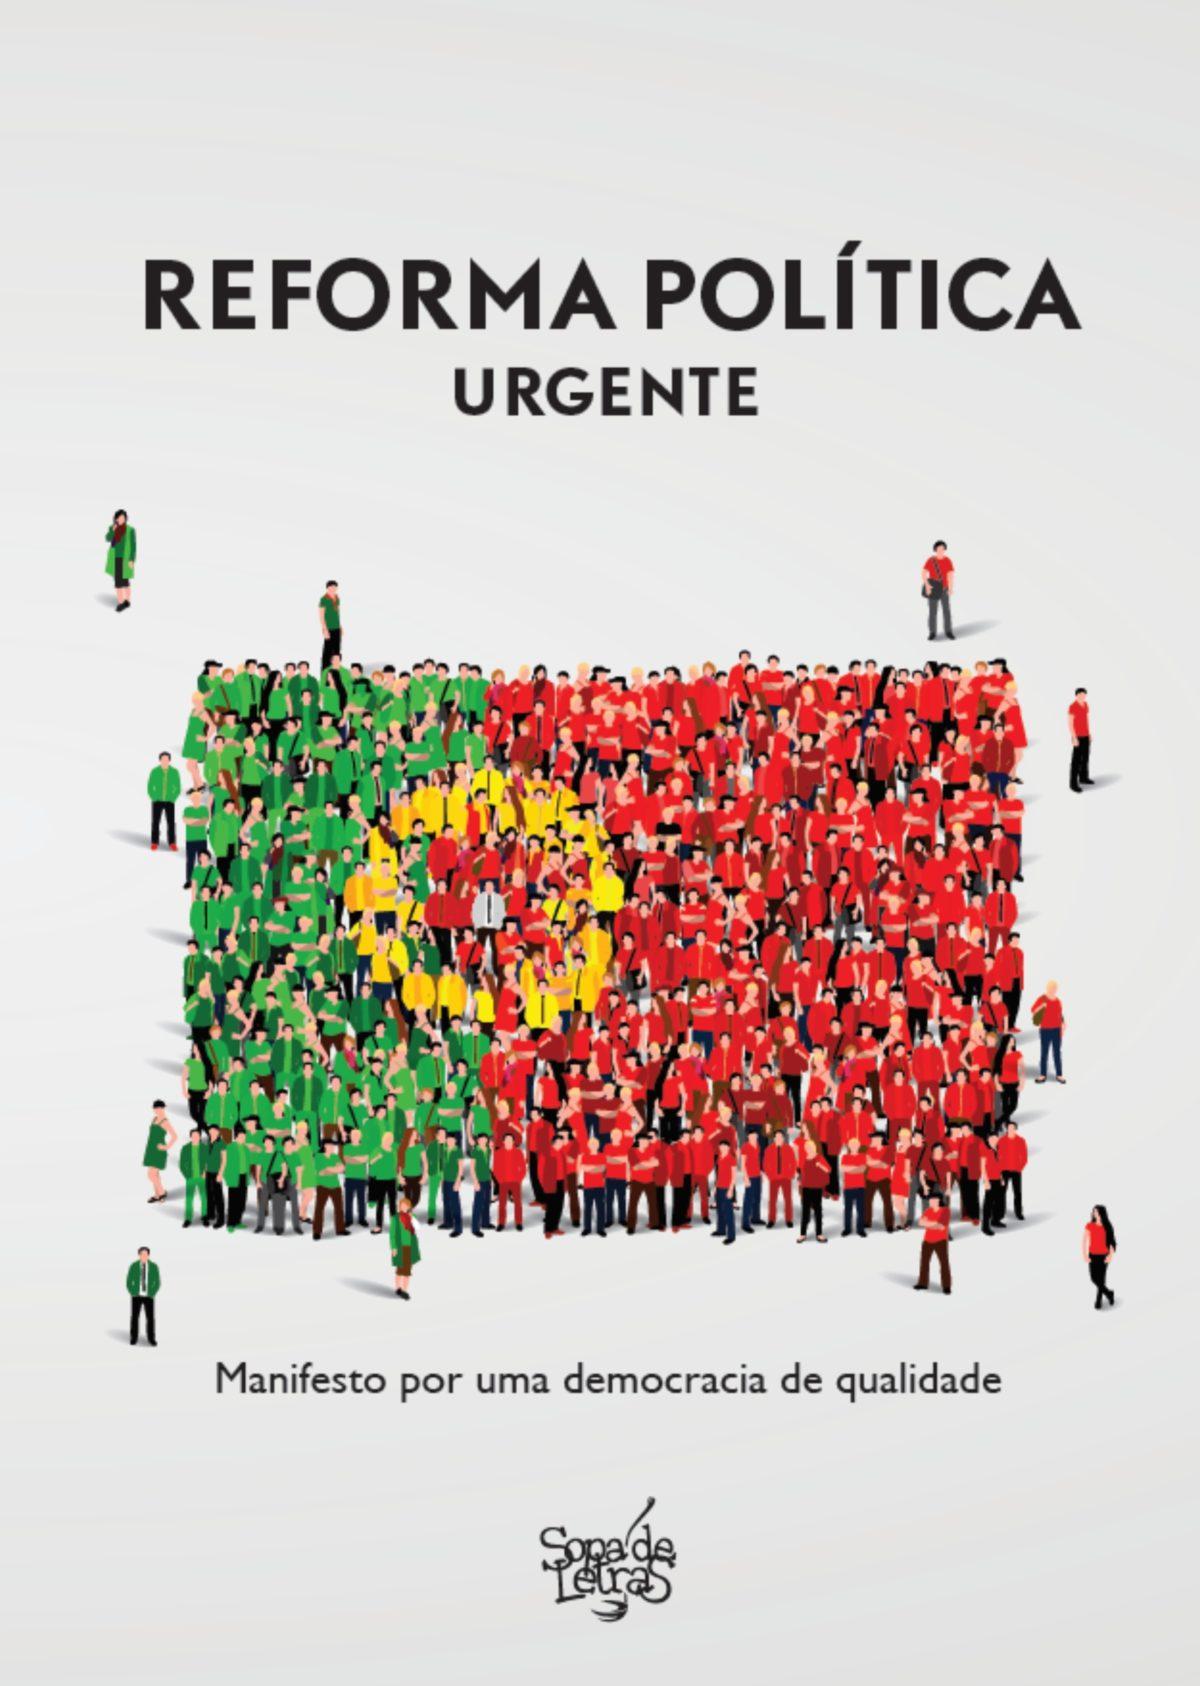 Reforma Politica Urgente  - OUTLET